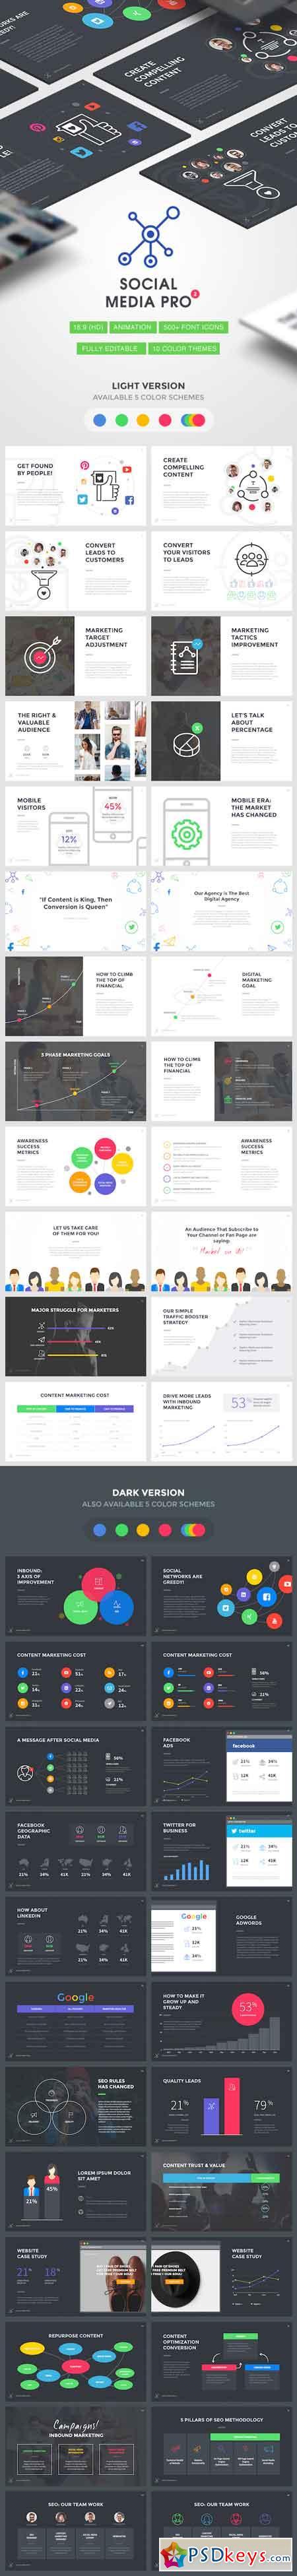 Social Media PRO 2 - Marketing Keynote Template 17652980